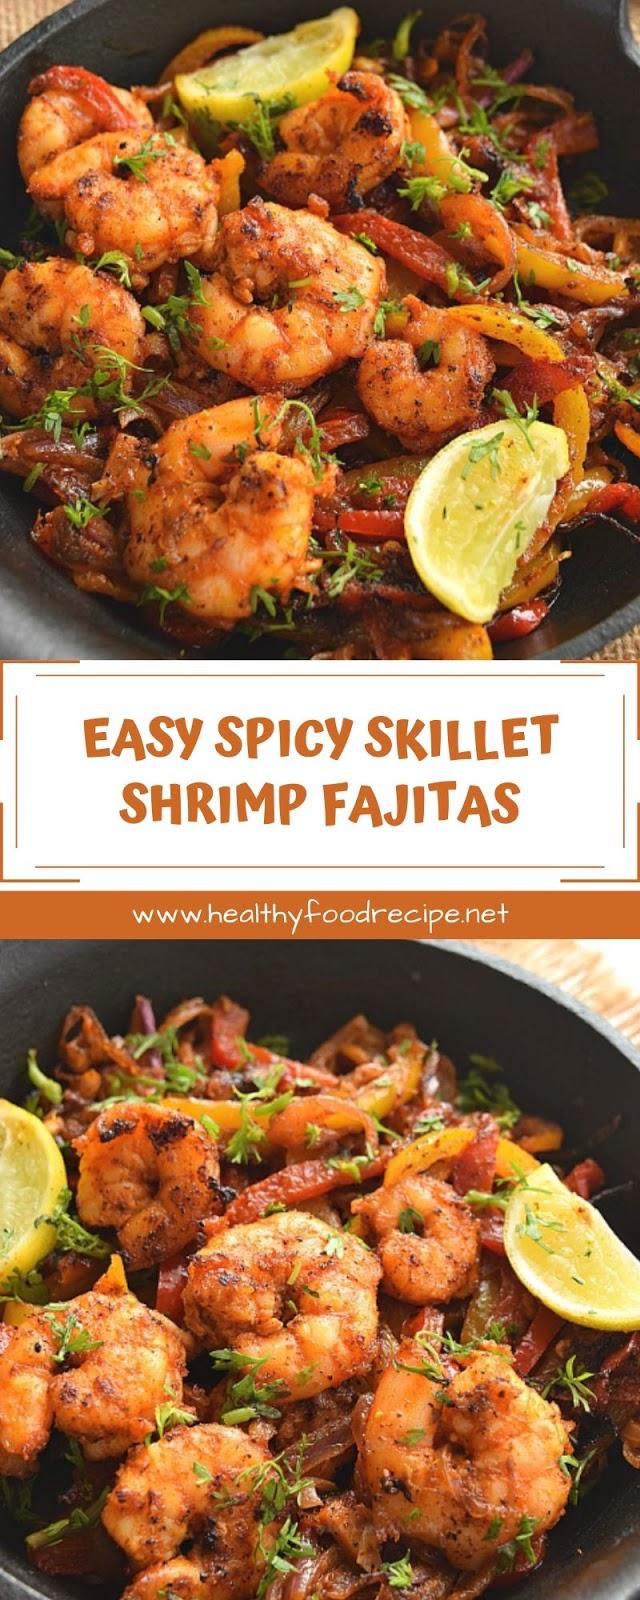 EASY SPICY SKILLET SHRIMP FAJITAS